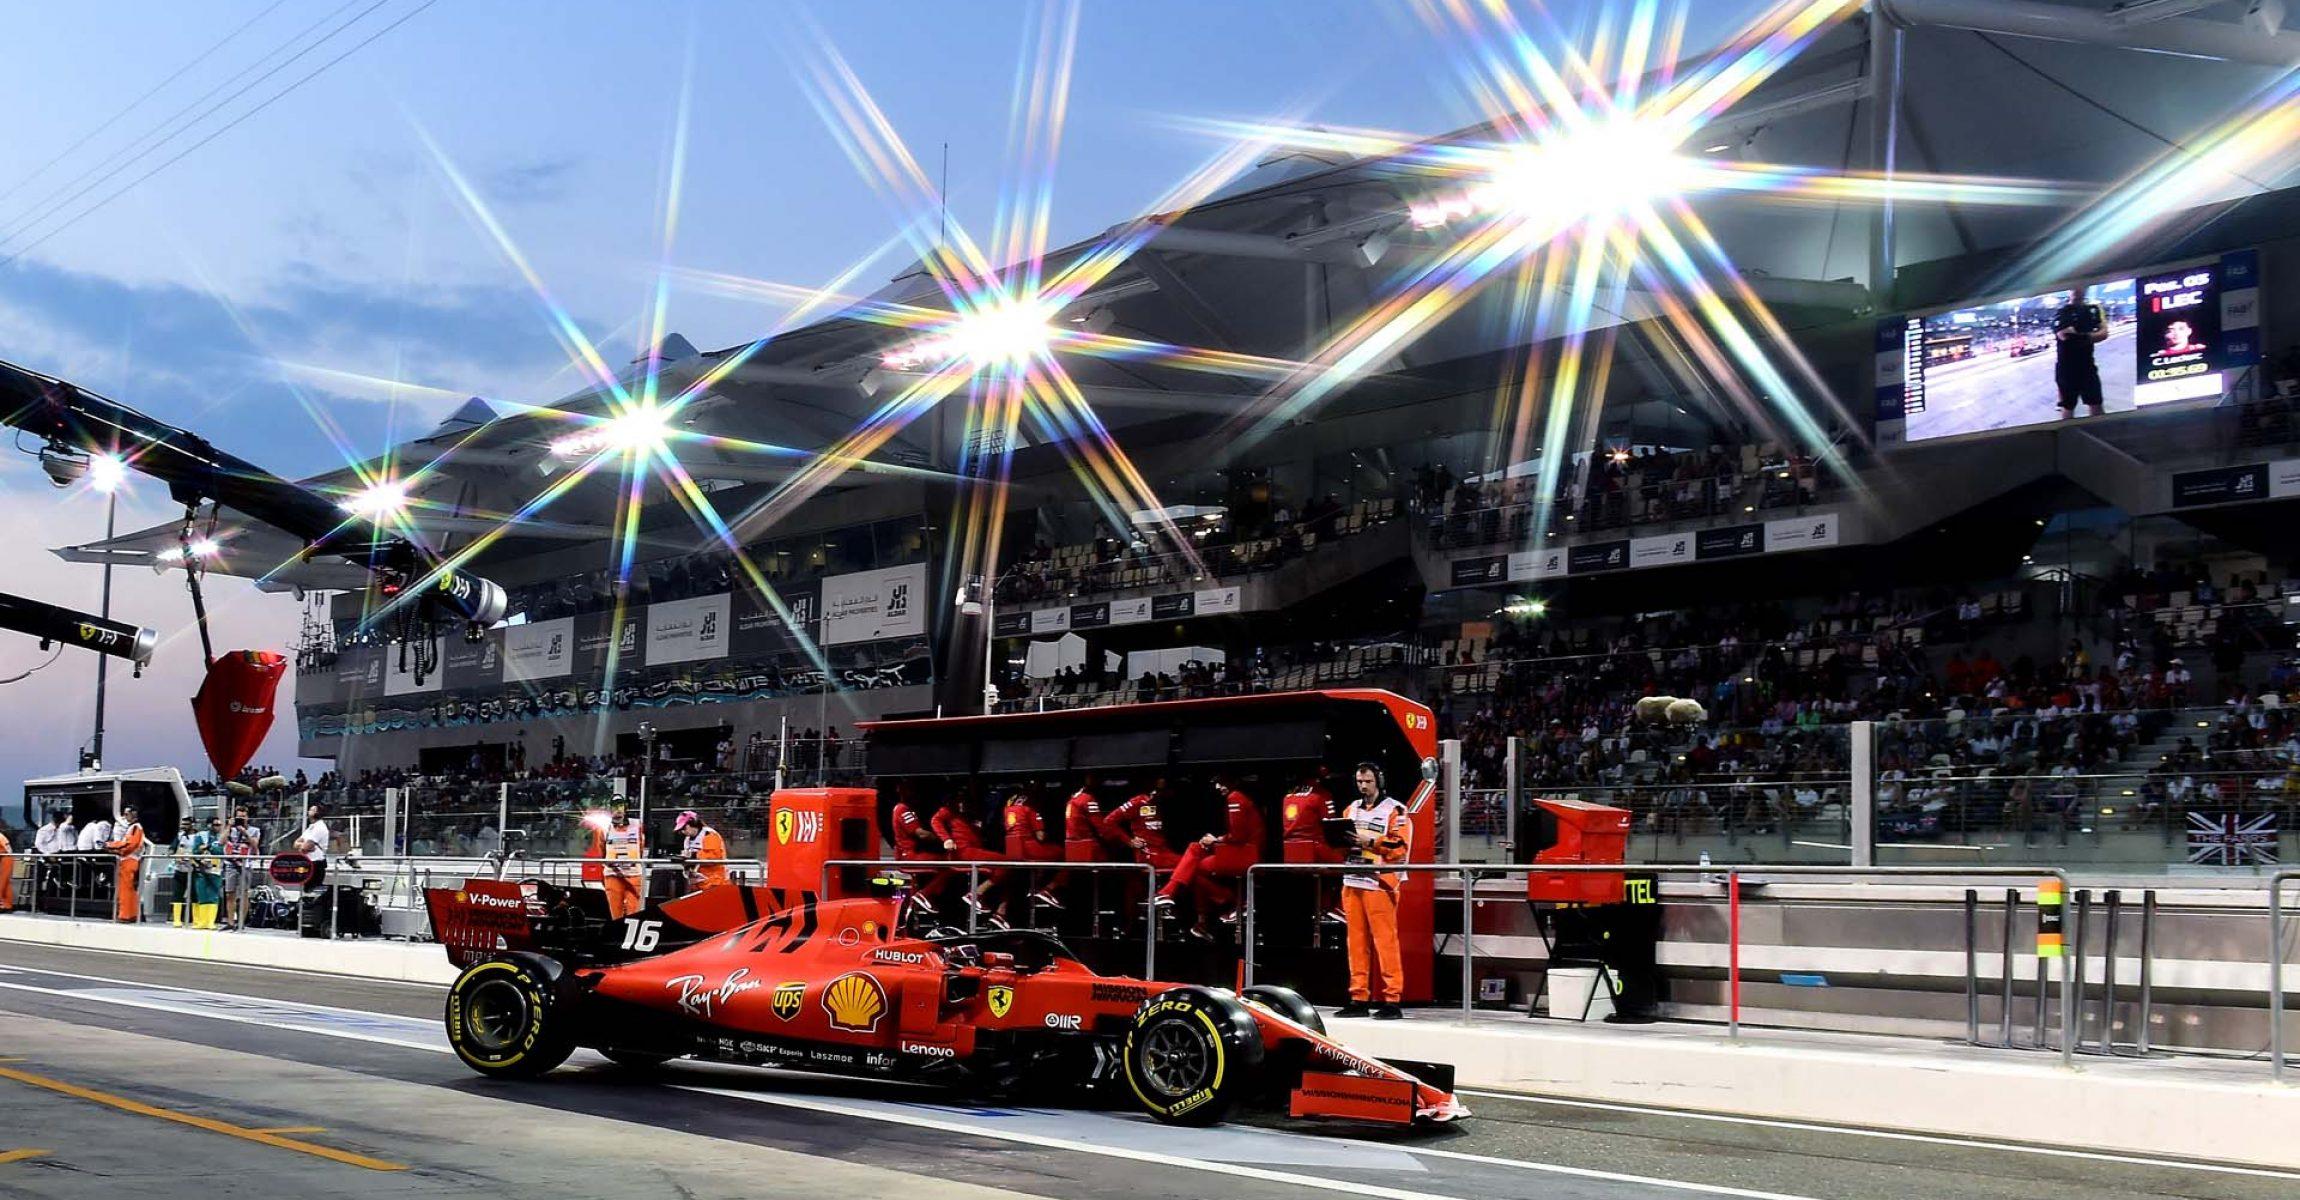 GP ABU DHABI  F1/2019 - SABATO 30/11/2019    credit: @Scuderia Ferrari Press Office Charles Leclerc